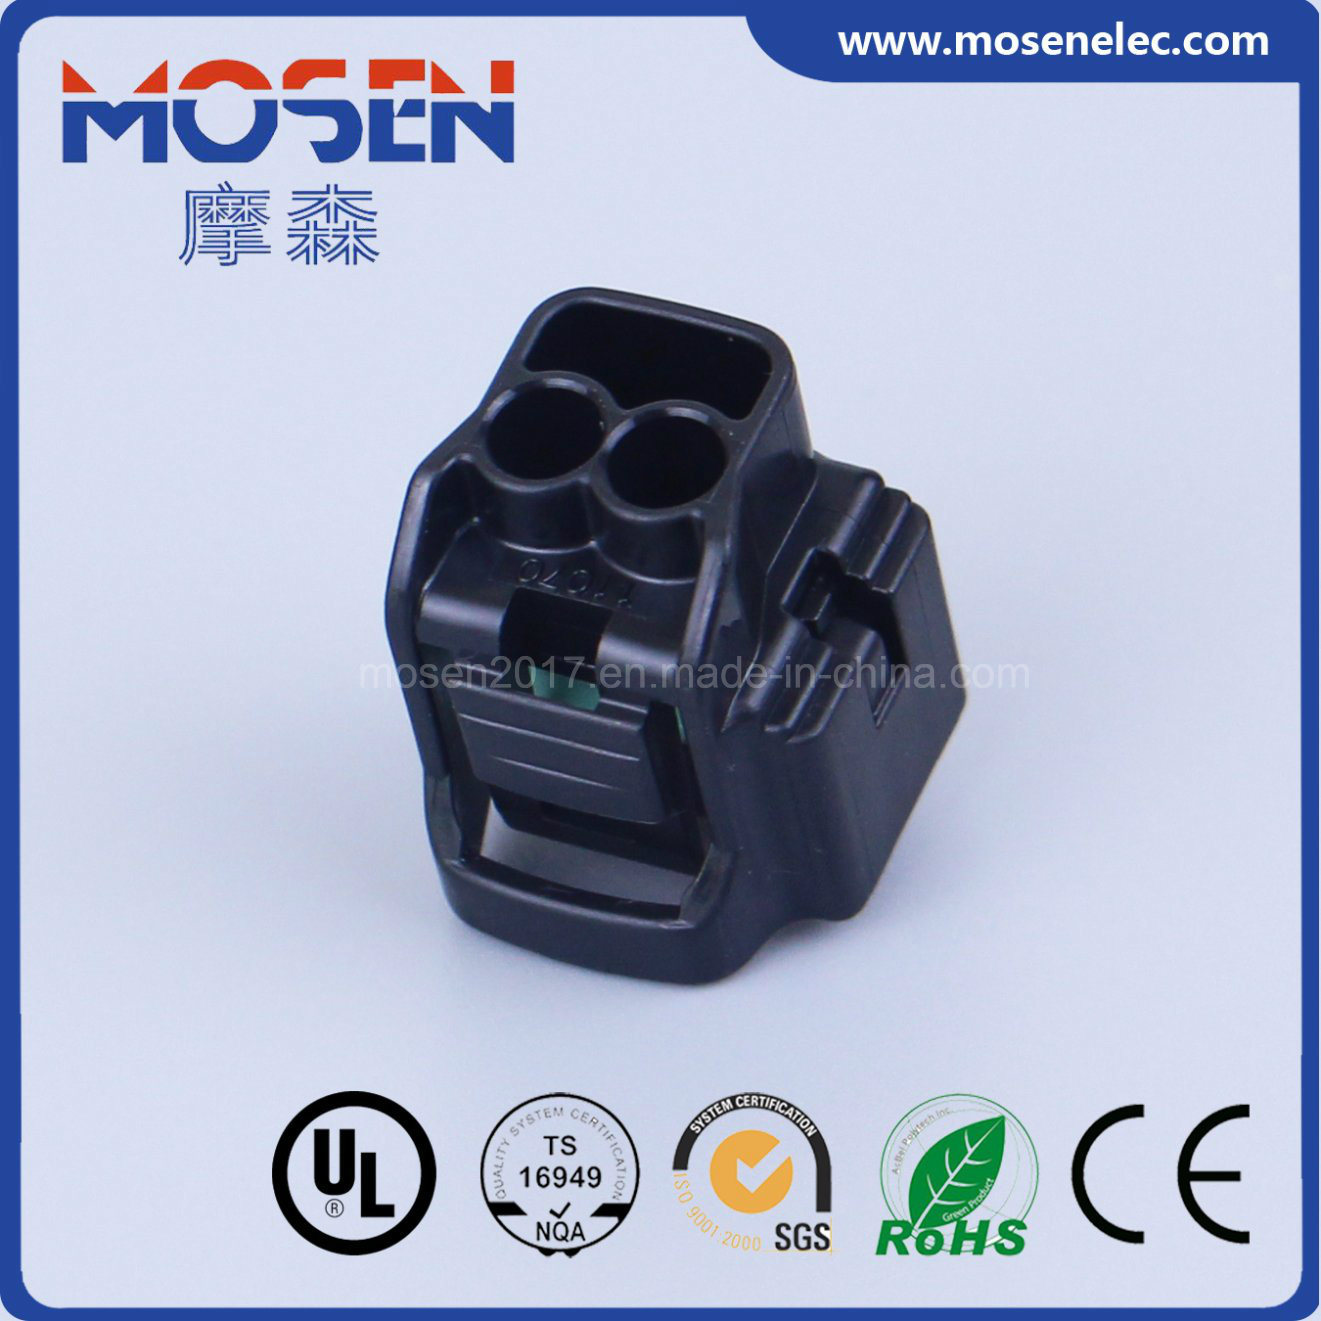 China Female Yazaki 2p Auto Connector 7283 7028 30 Nissan Automotive Wire Harness Tf